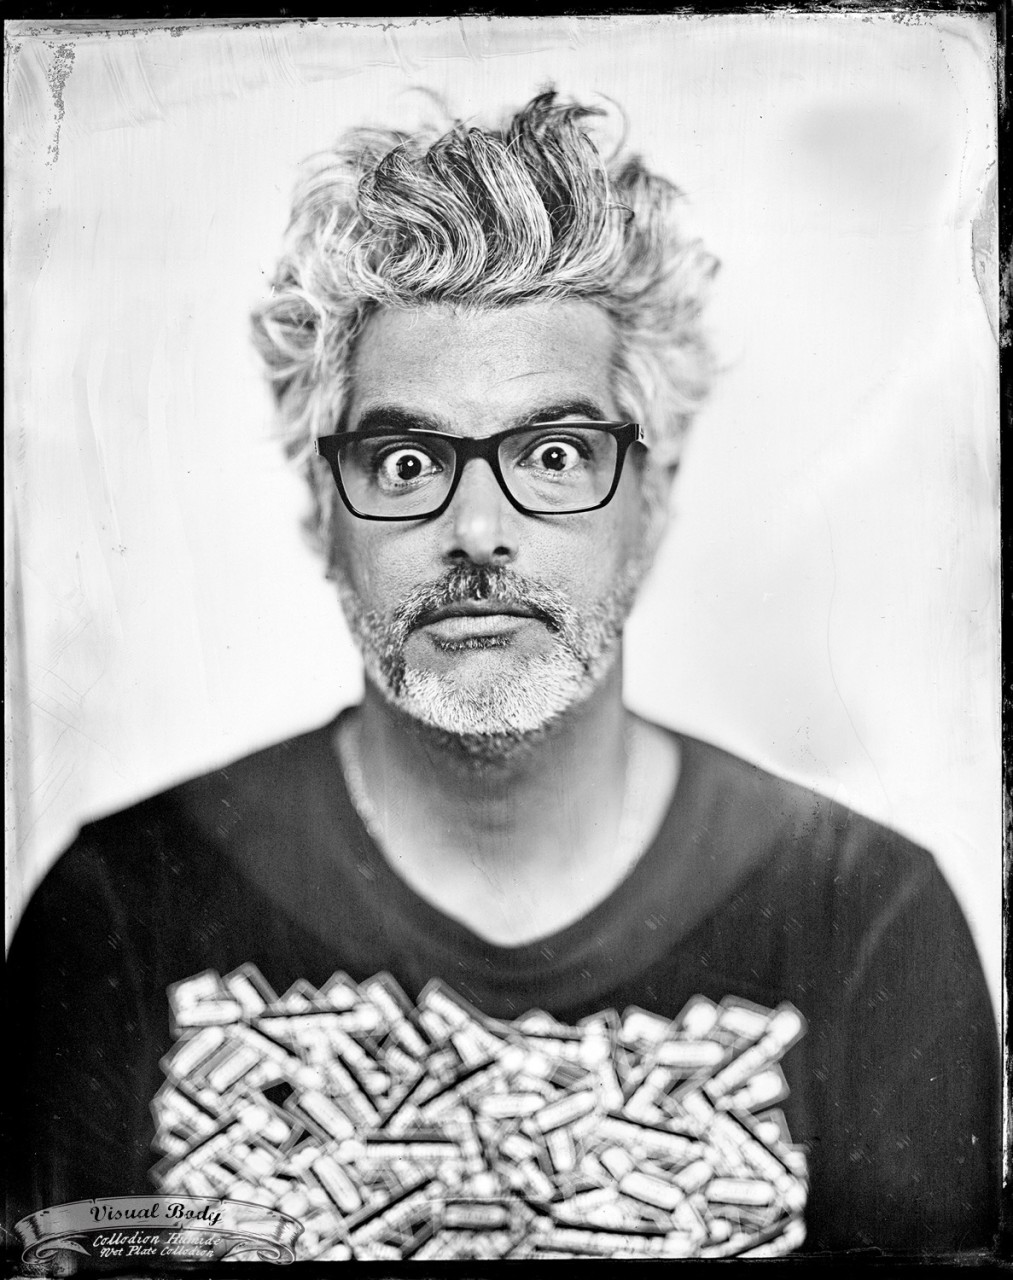 Real Béland. Profession: humoriste/comedian.